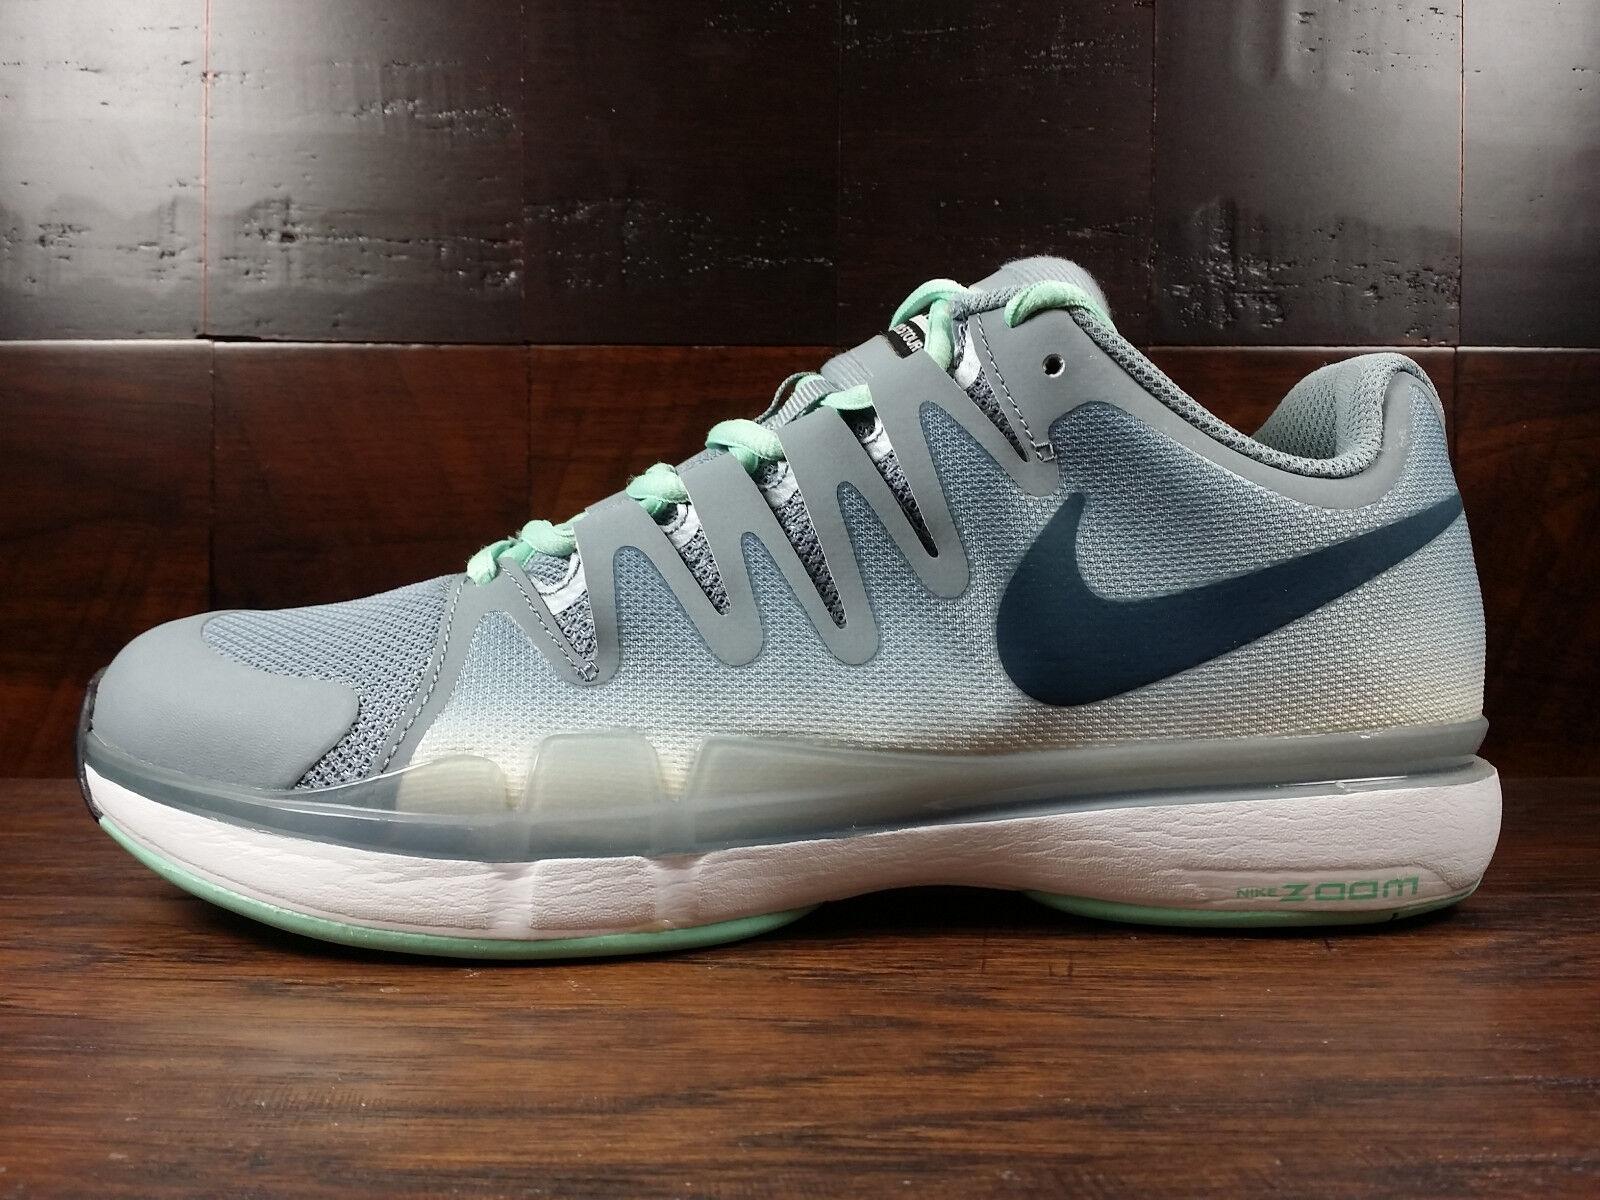 Nike Zoom Vapor [631458-043] 9.5 Tour (Magnet Grey/Mint) Federer Tennis [631458-043] Vapor Uomo 551a7b